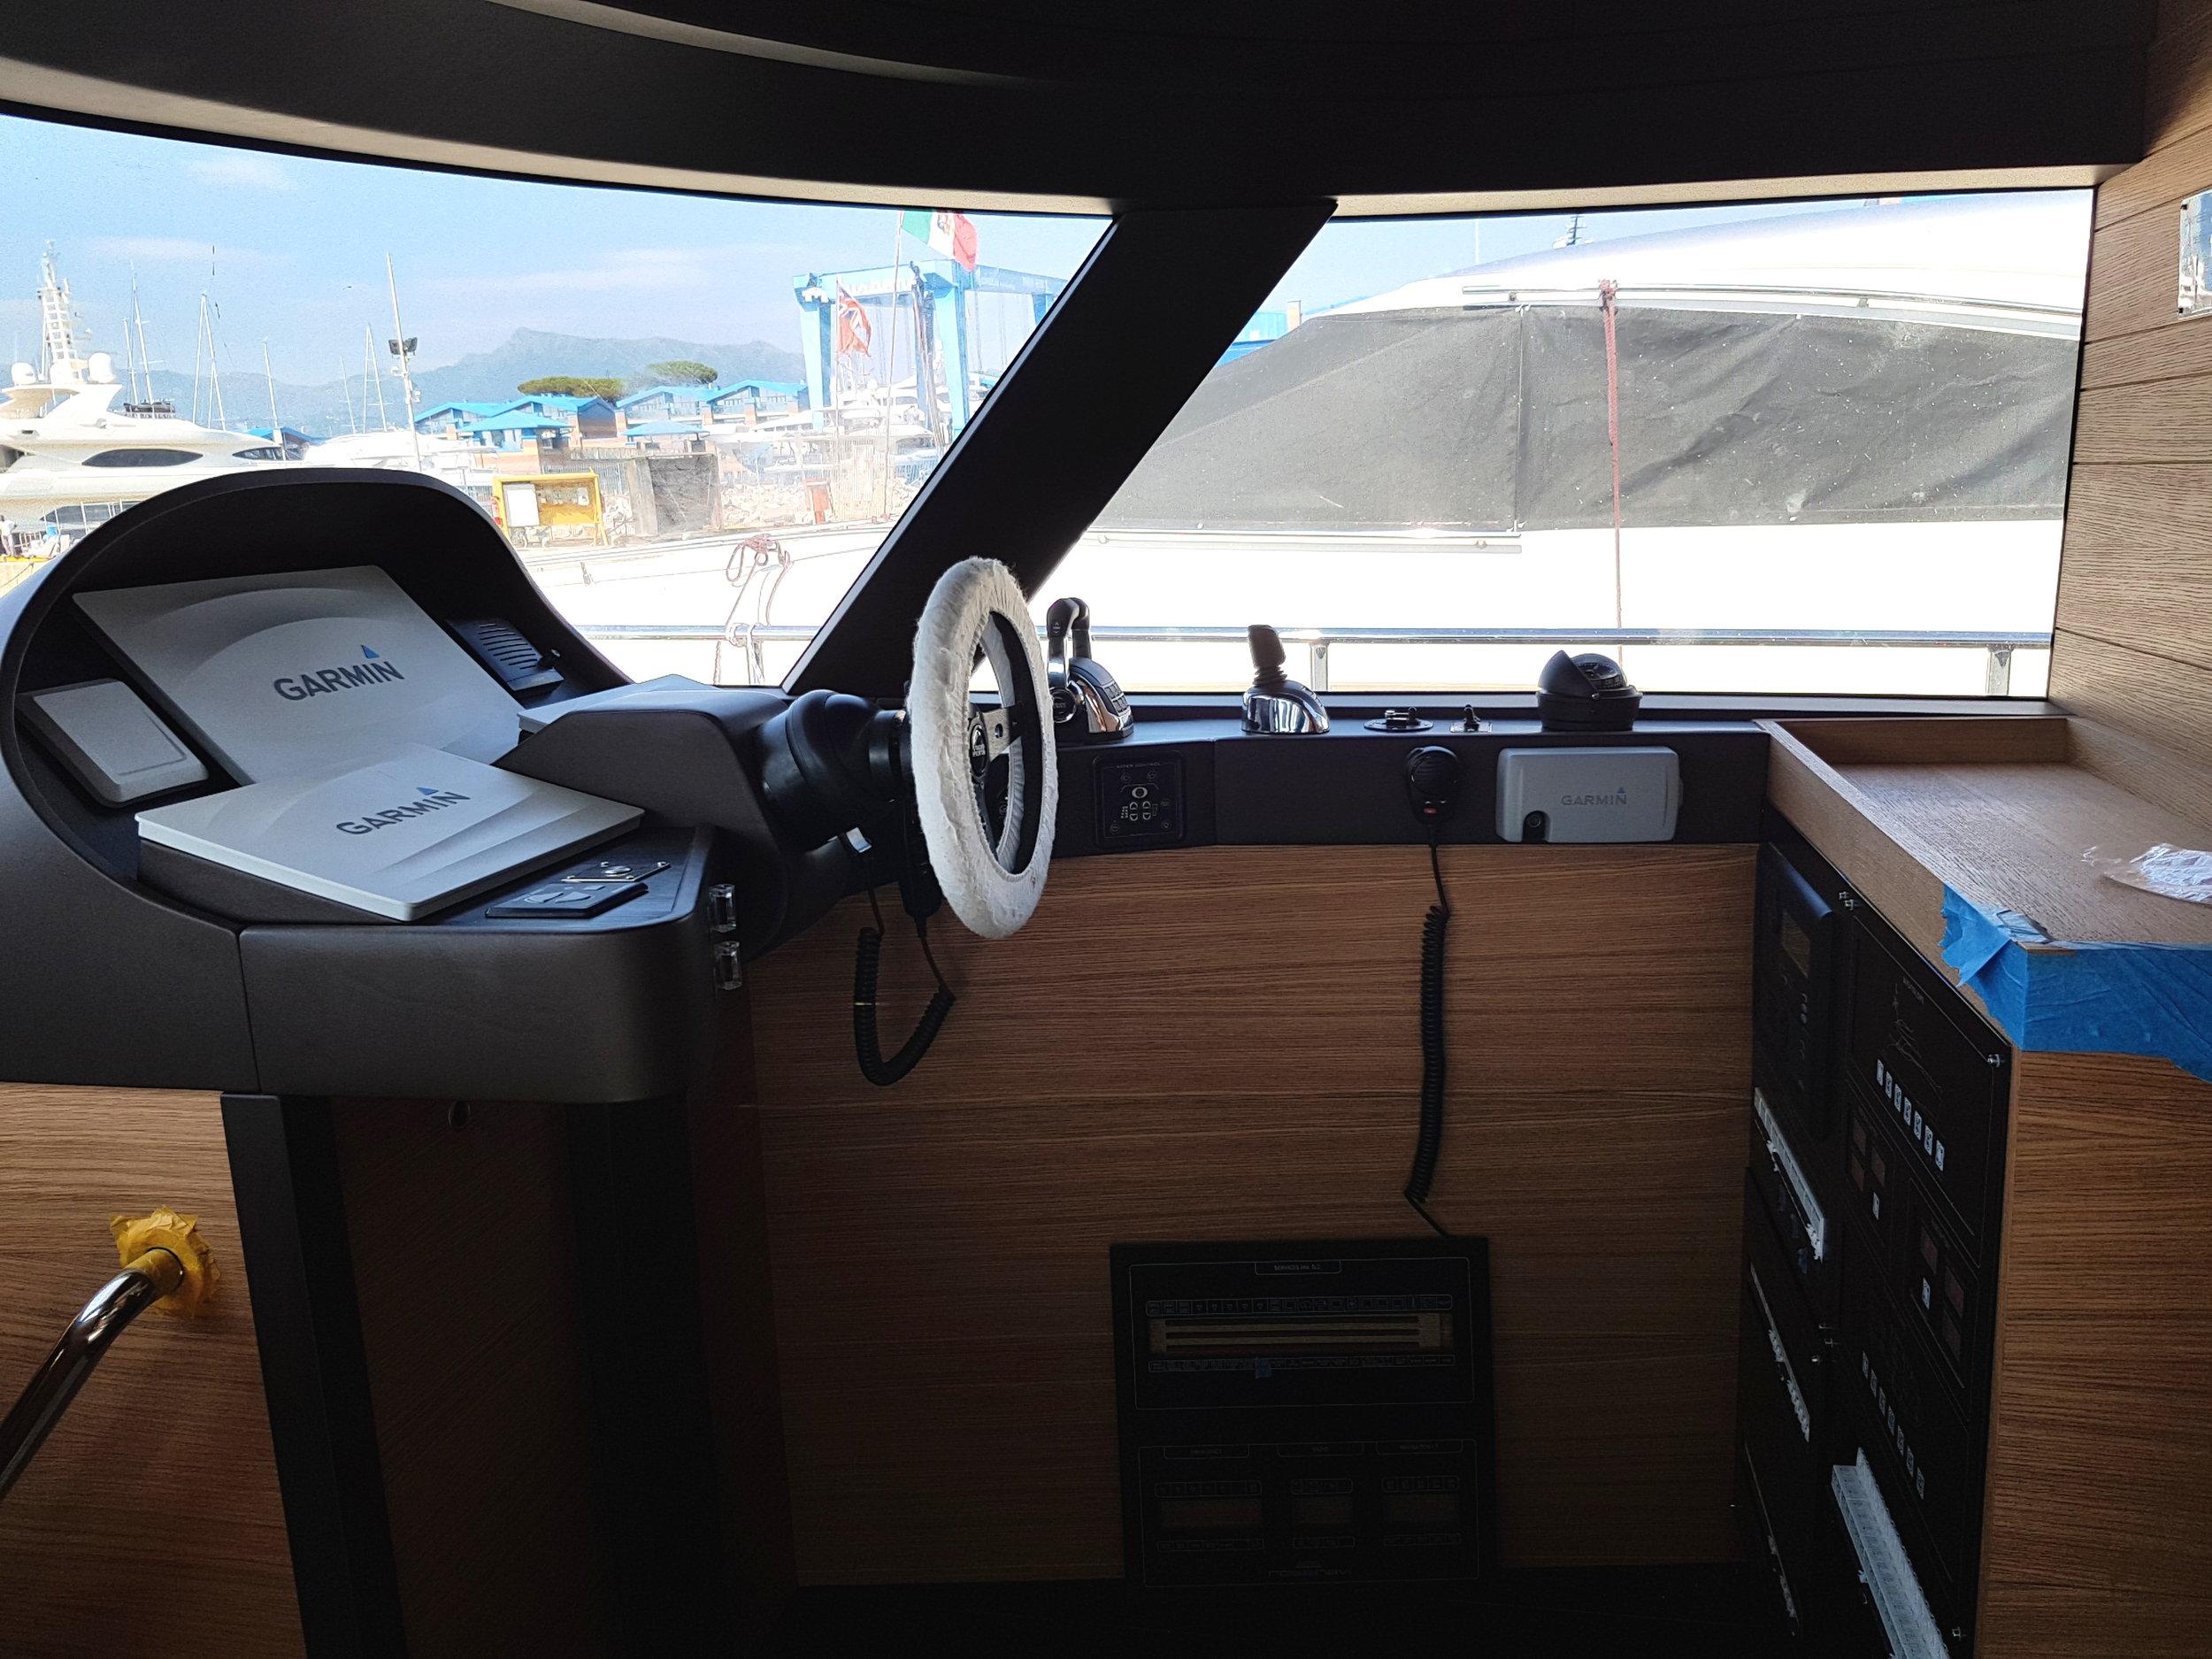 Foto-main wheelhouse-pilot station-Istante-design- yacht-general arrangement-profile-sketch architect-carignani-design-concept-luxury-boat-motor.jpg